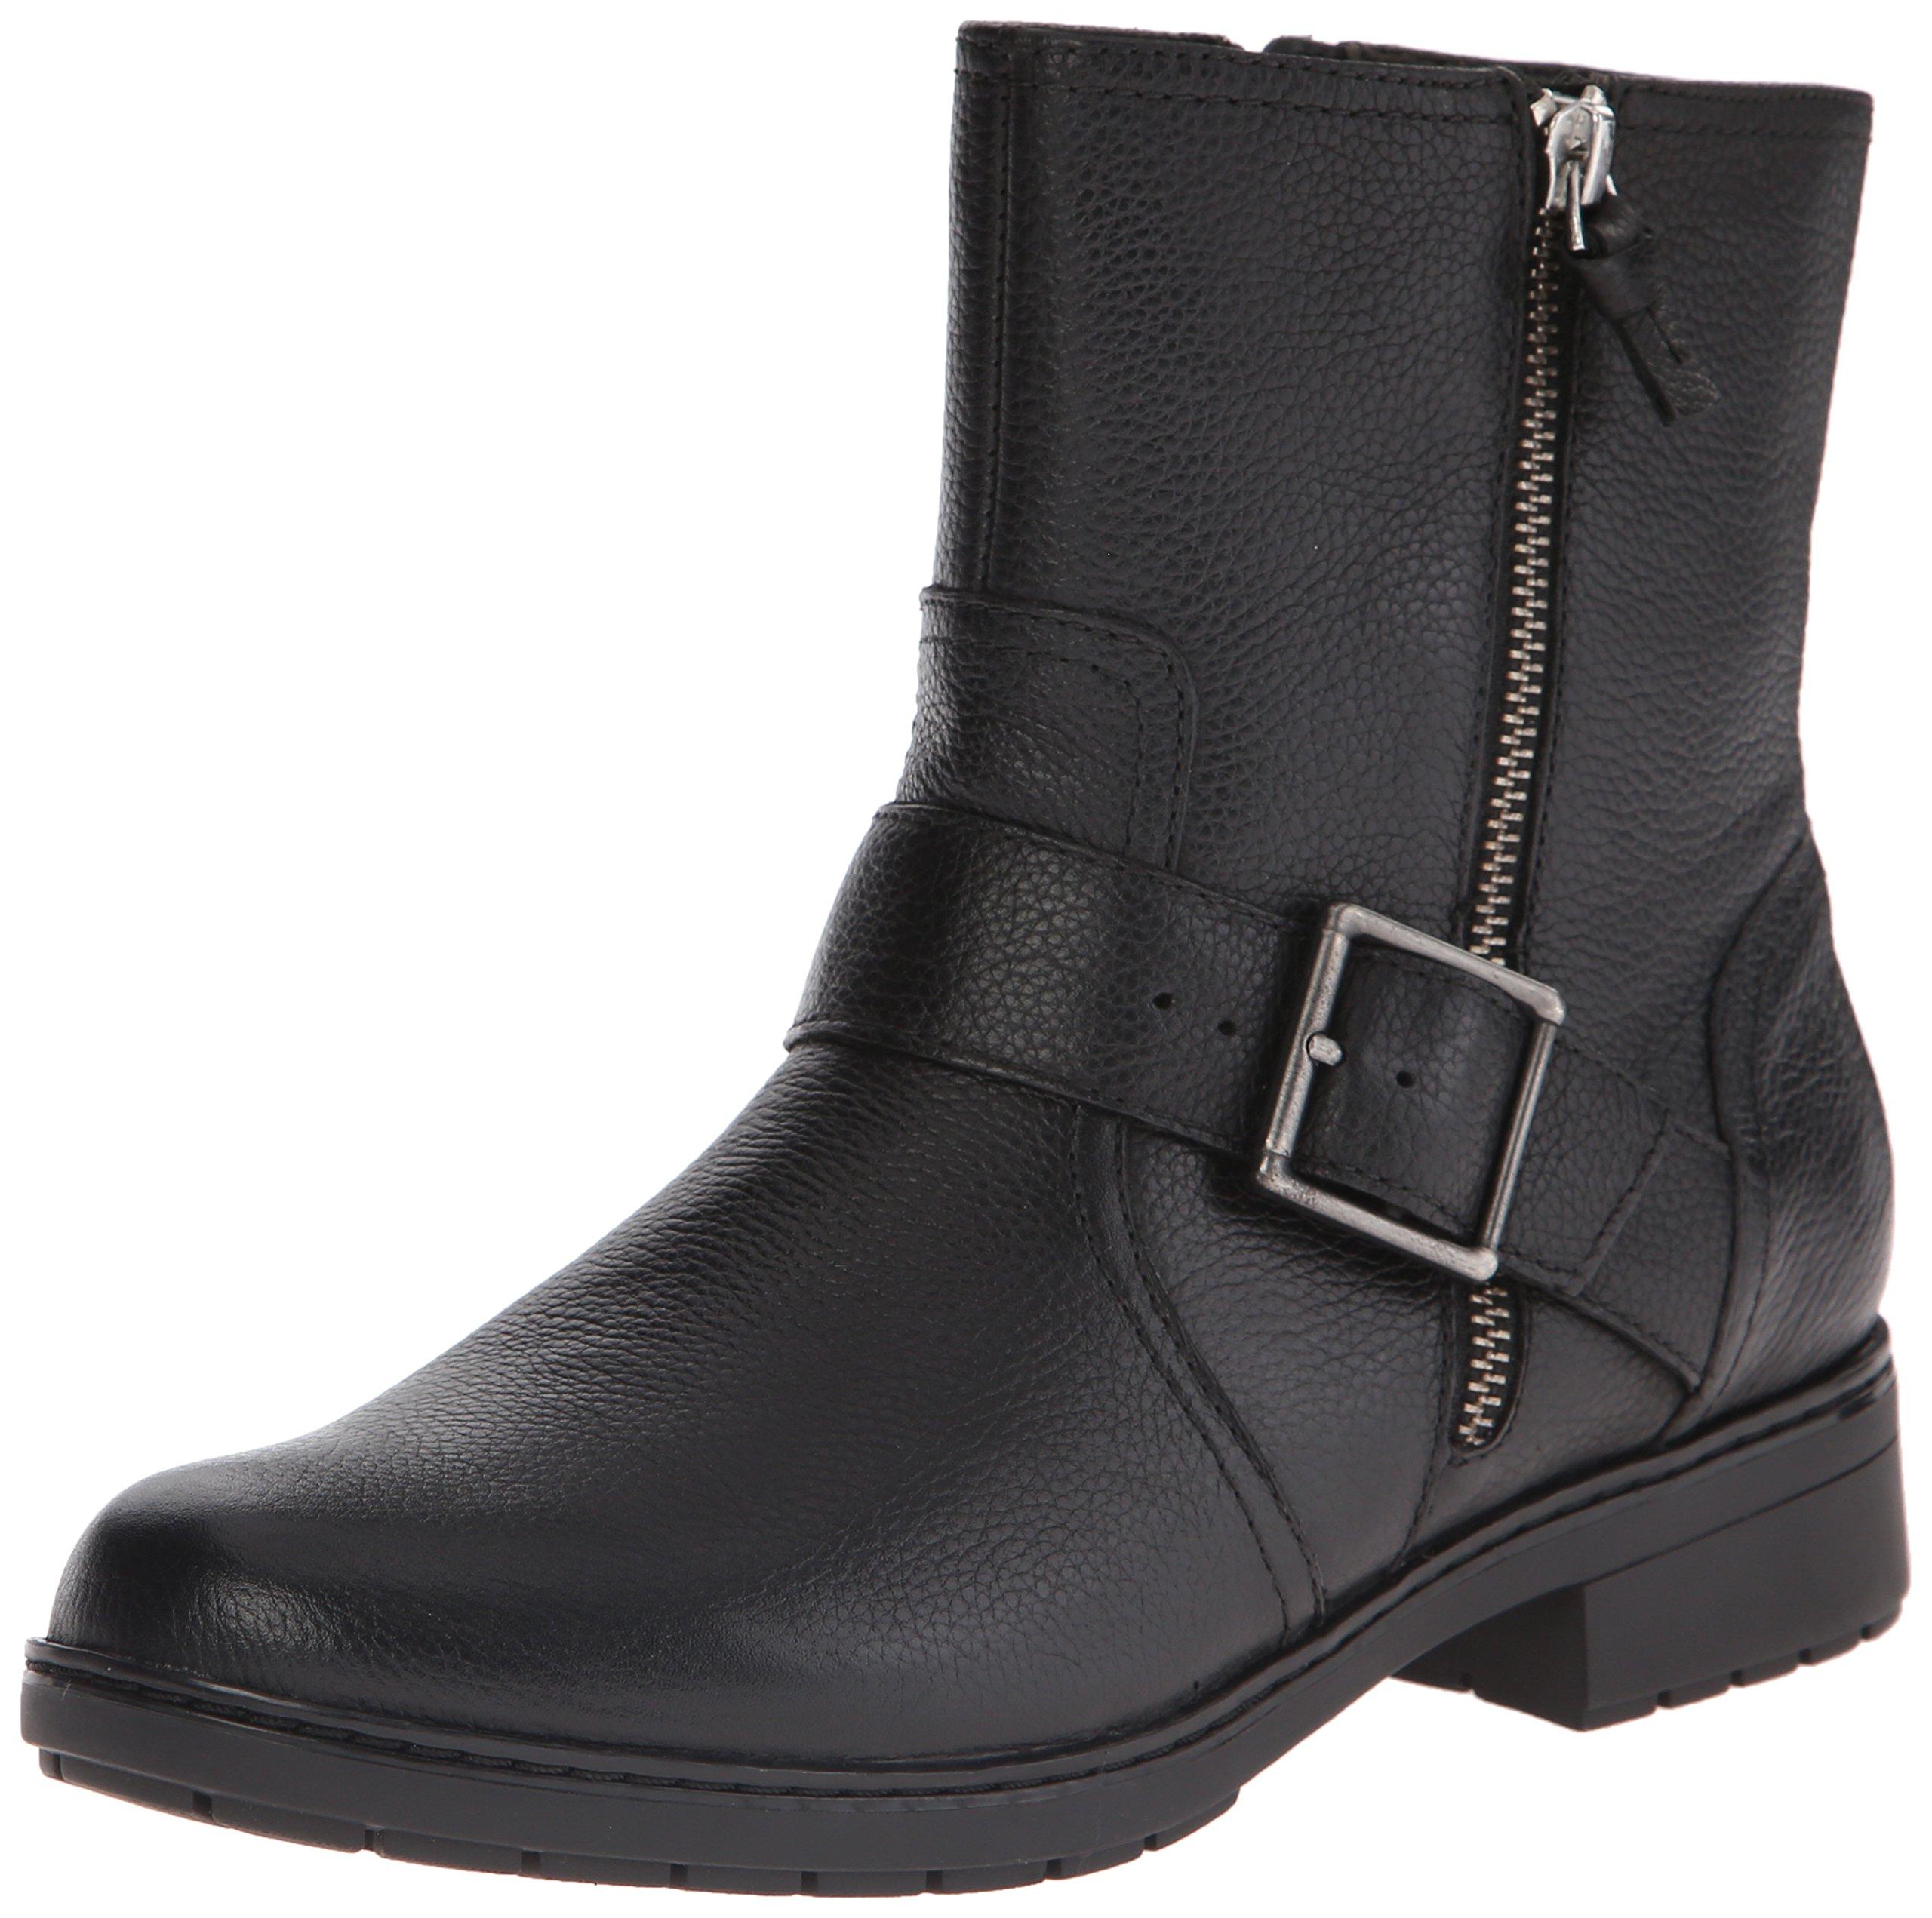 CLARKS Women's Merrian Lynn Boot, Black Leather, 10 M US